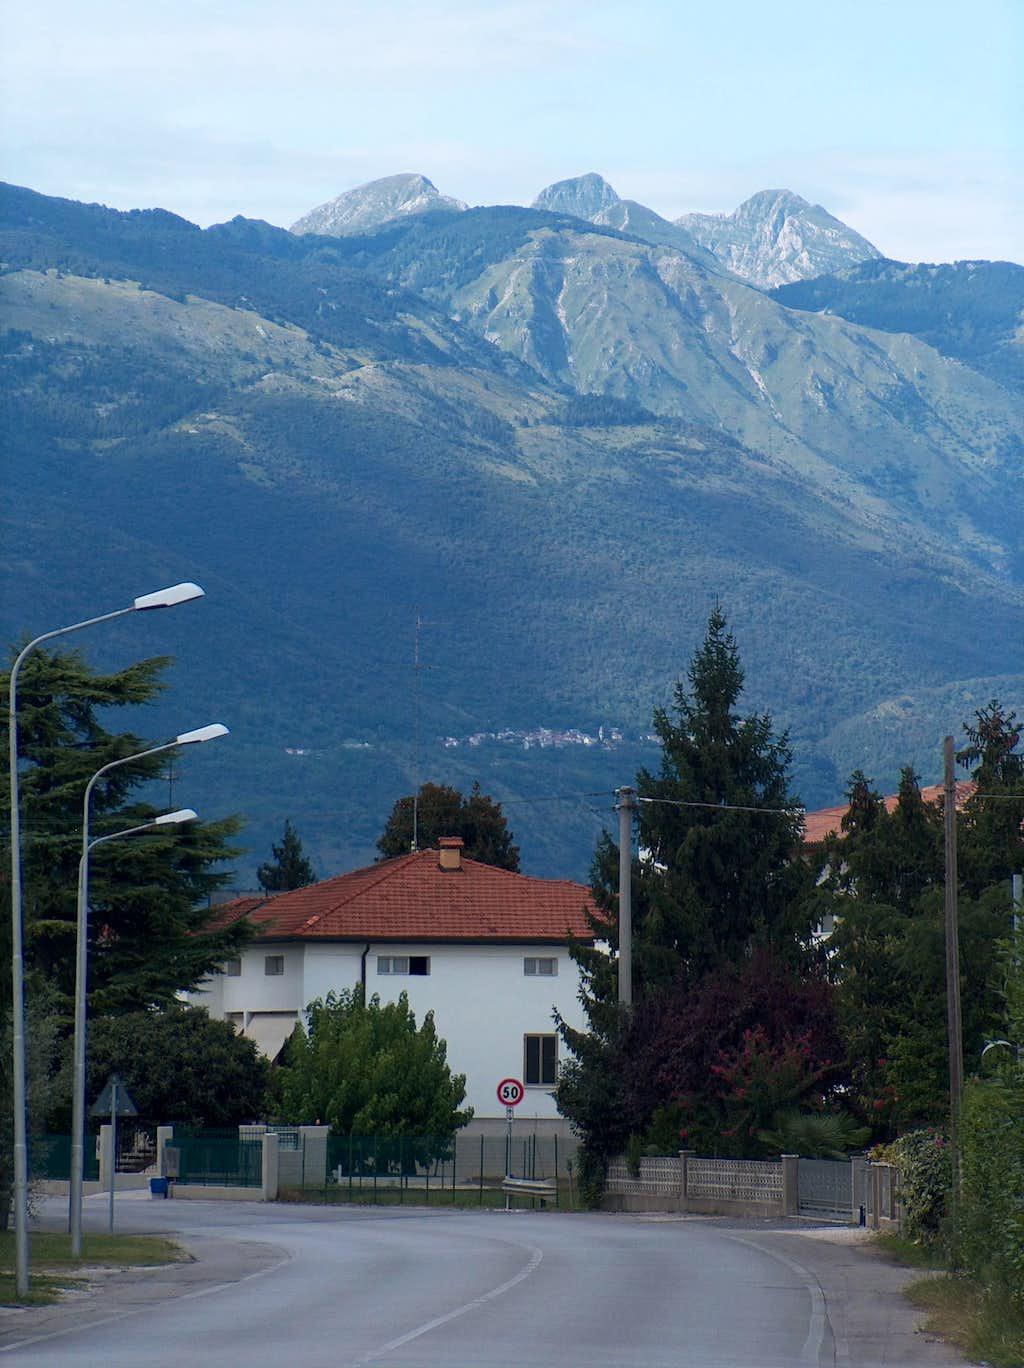 The Italian Alps as seen from near Sarone di Caneva